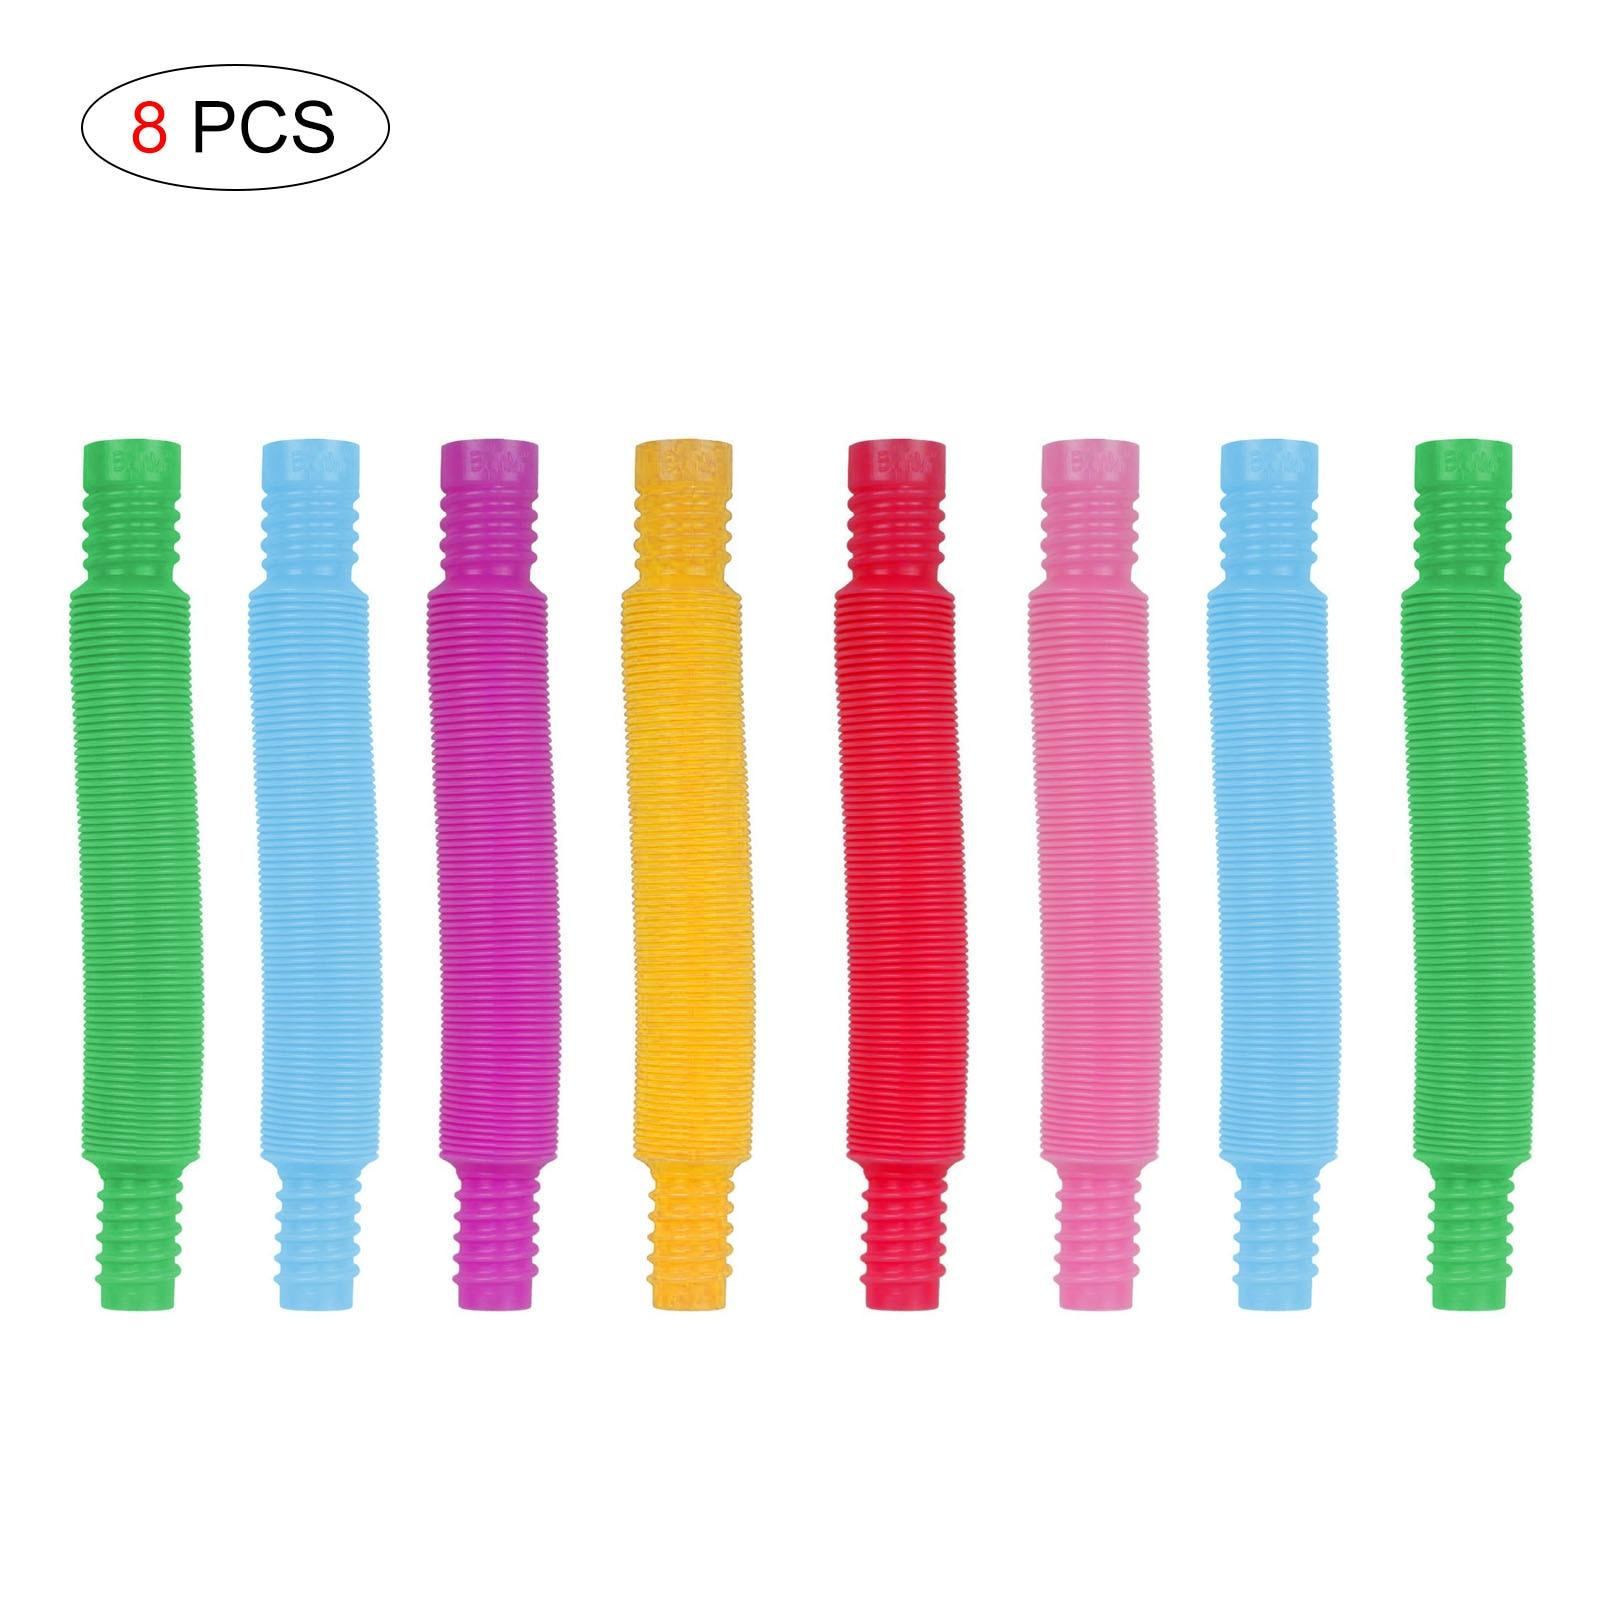 Kids Mini Pop Tubes Fidget Toy Stress Relief Sensory Adult Decompression Educational Mini Finger Squ